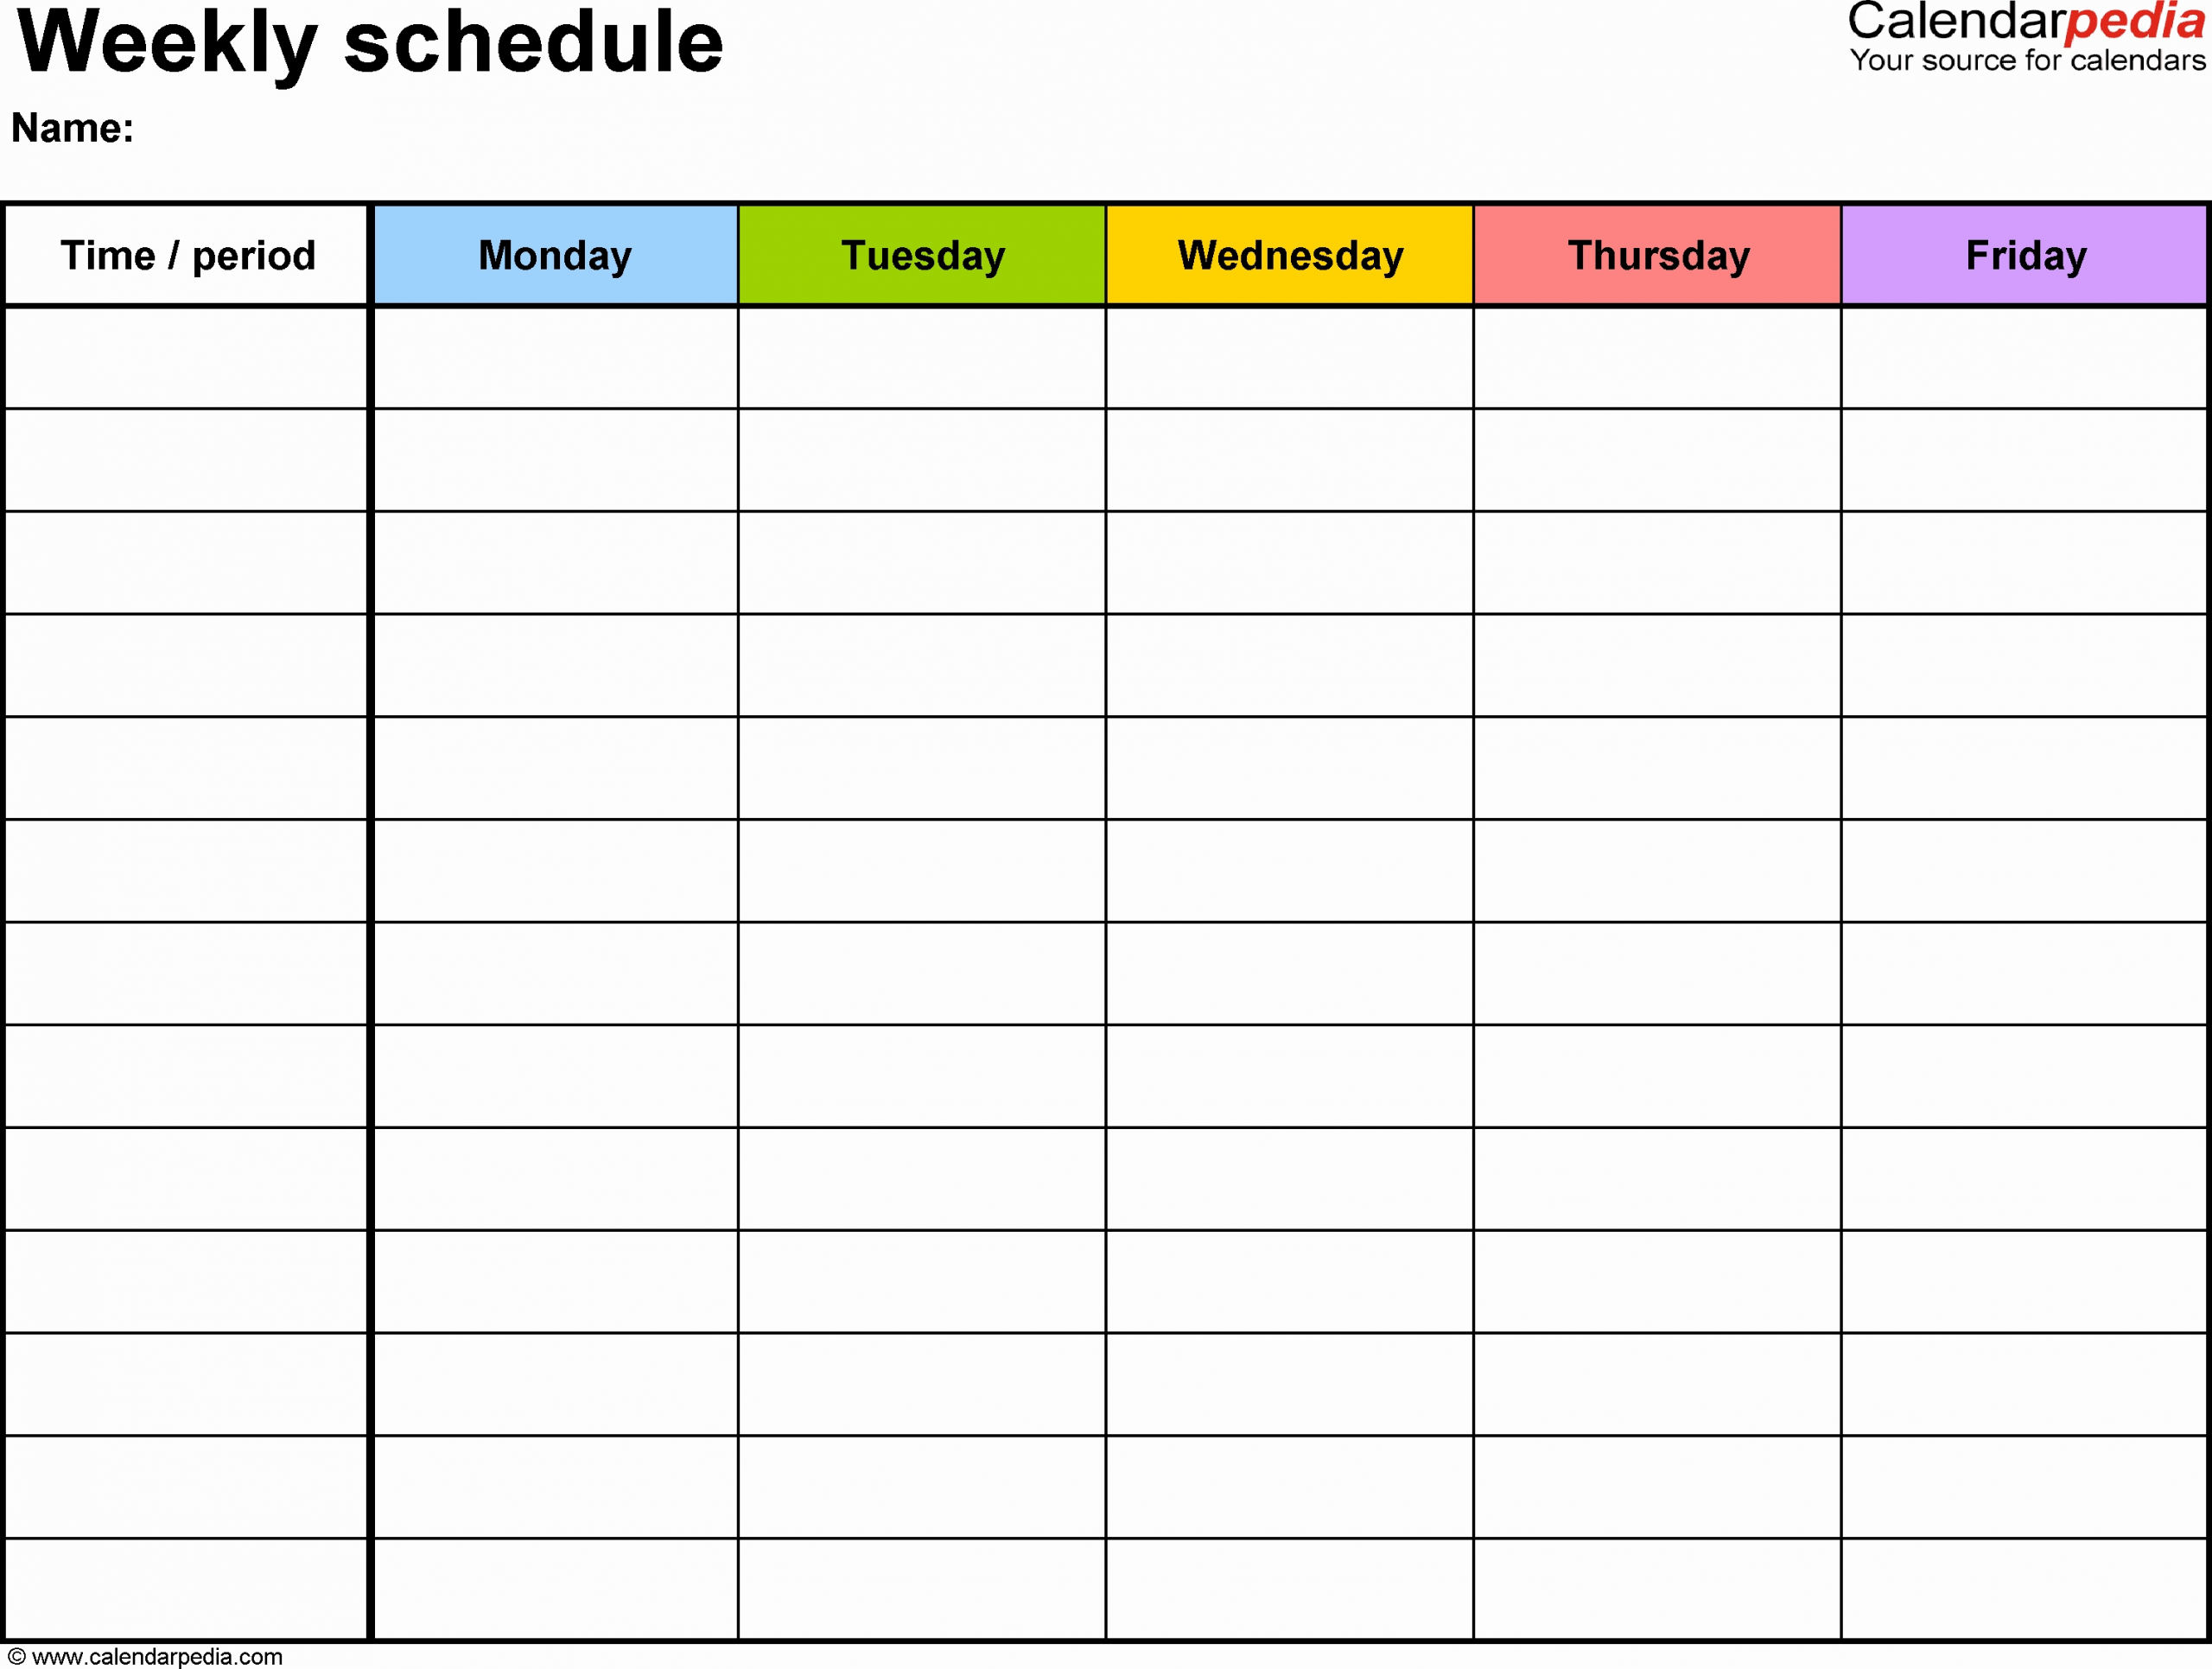 Depo Provera Calendar 2020 Does It Change | Calendar Depo-Provera Due Date Calendar